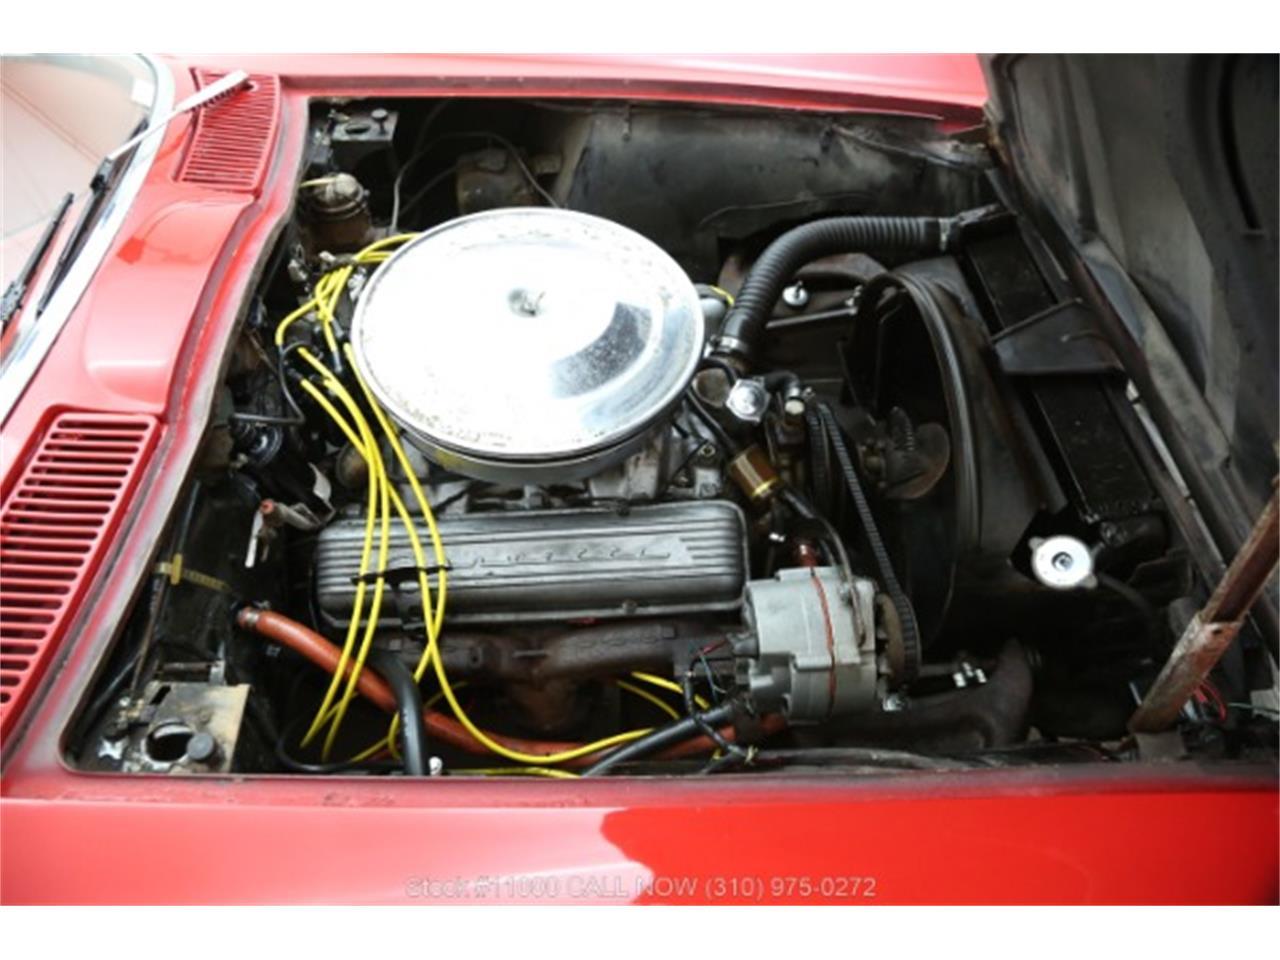 Large Picture of '64 Corvette - $34,750.00 - QEND